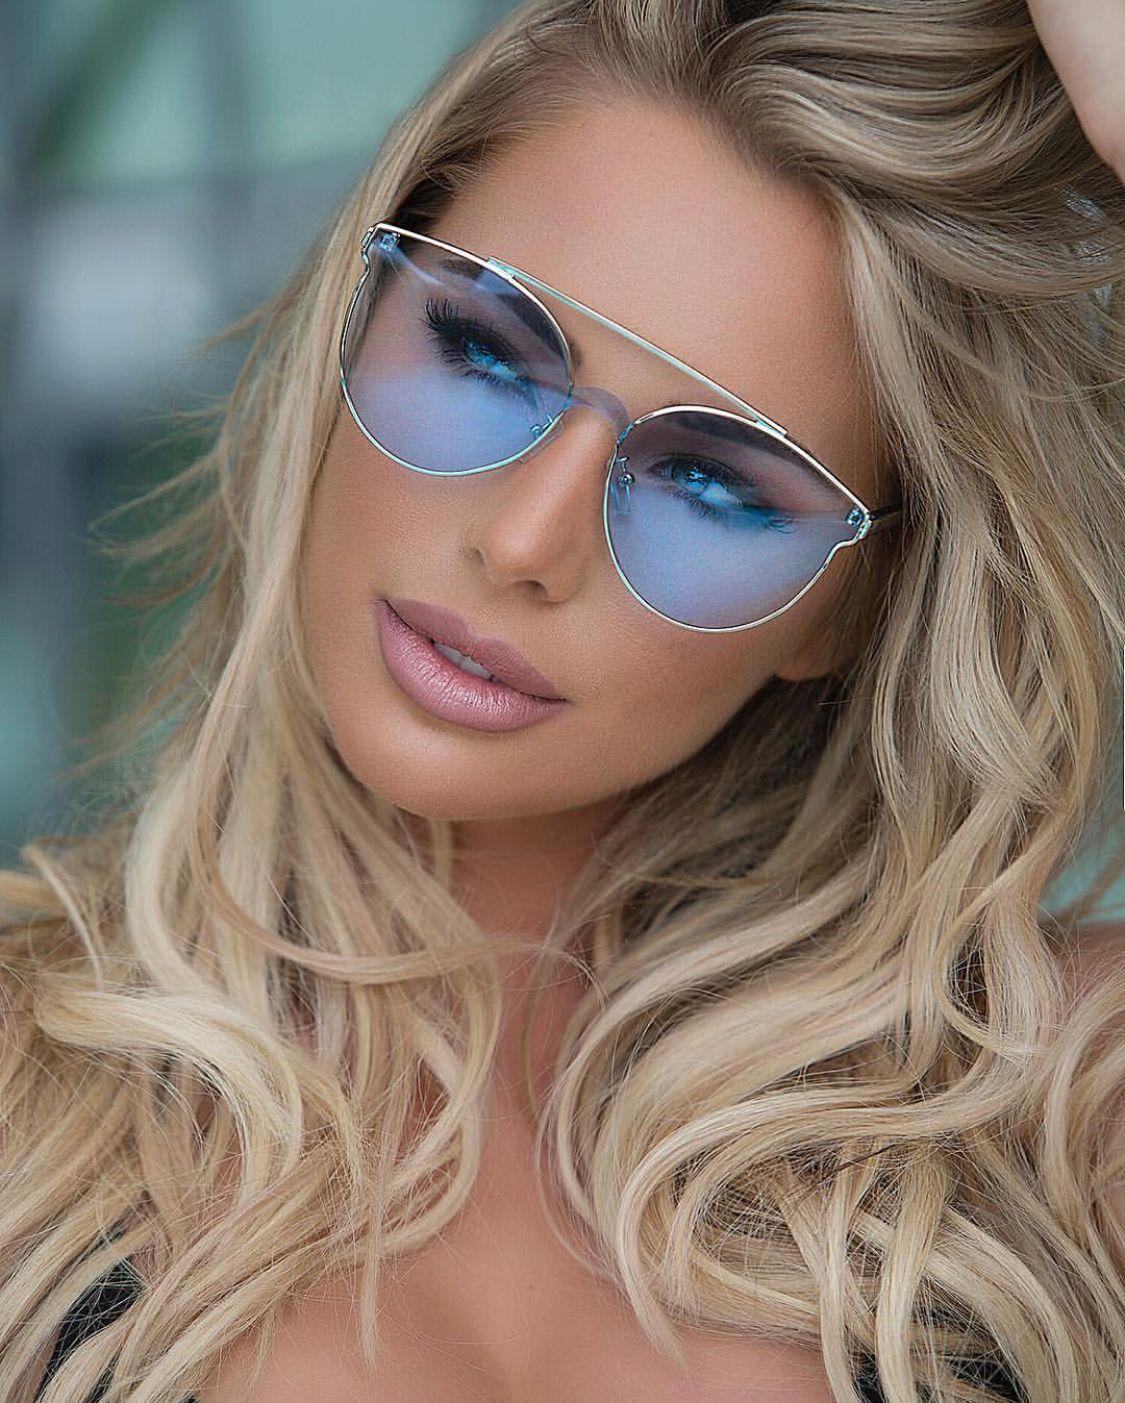 Картинки блондинки и очки